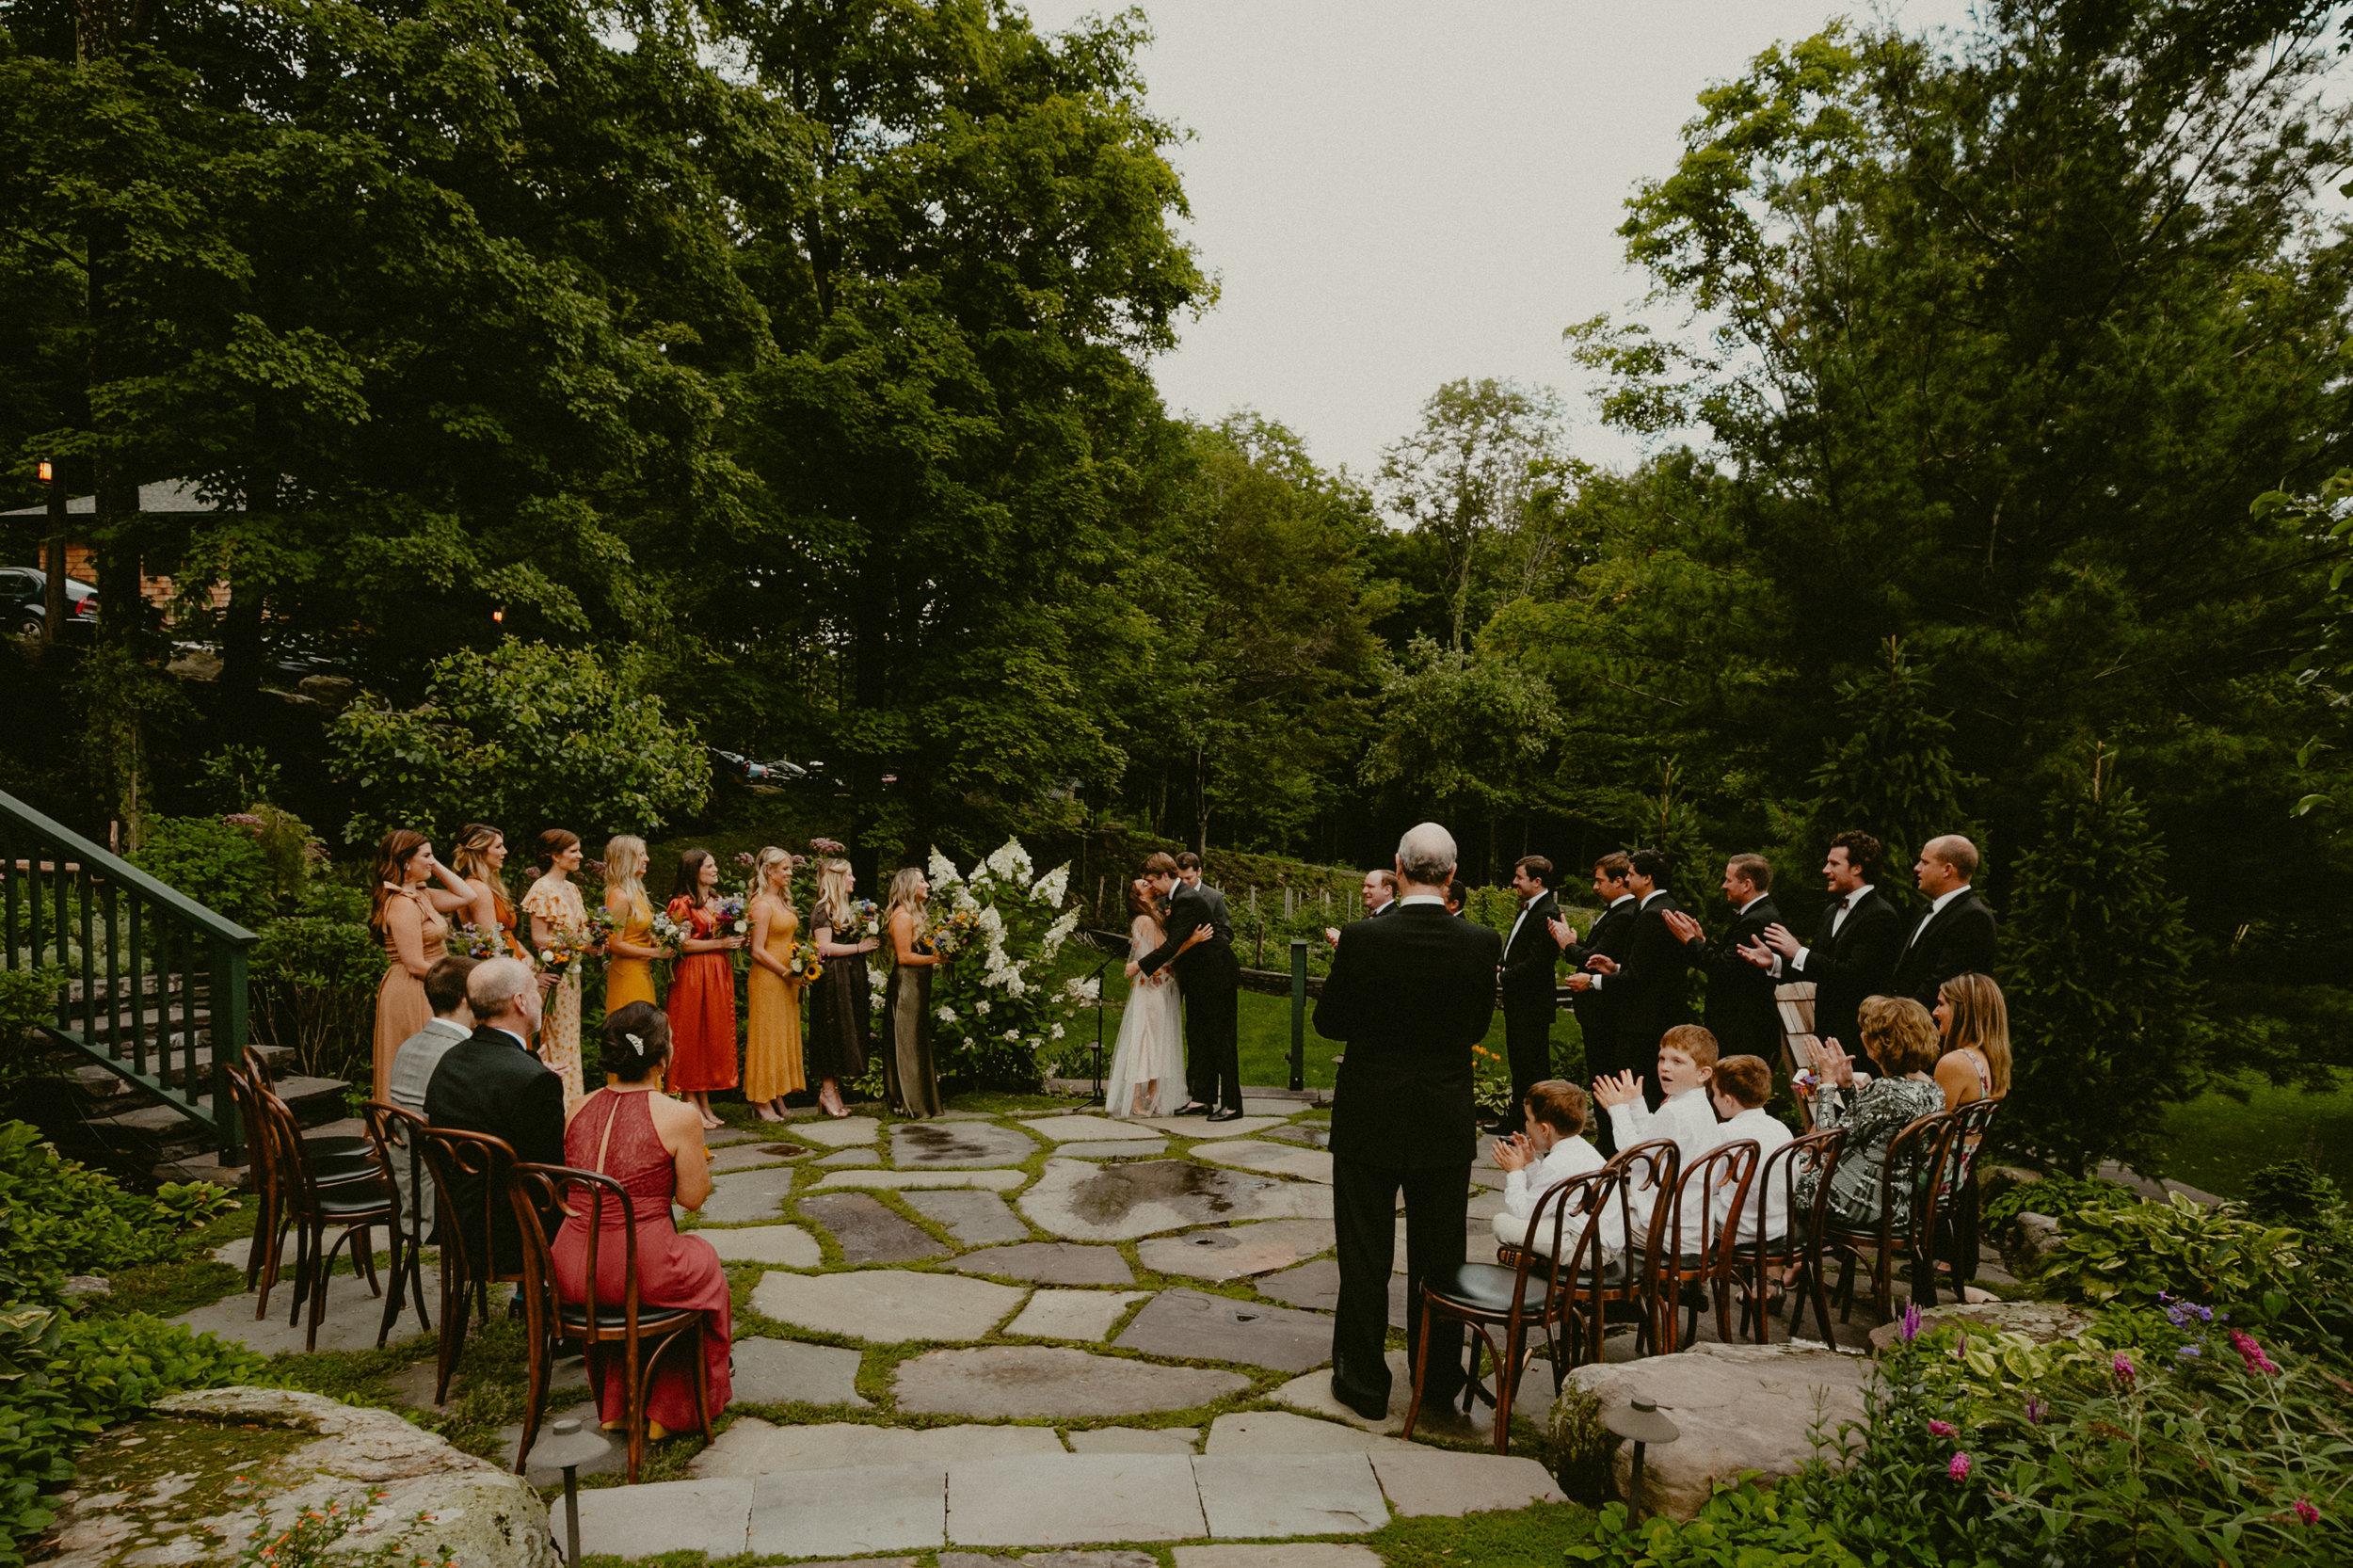 DEER_MOUNTAIN_INN_WEDDING_CHELLISE_MICHAEL_PHOTOGRAPHY-1406.jpg